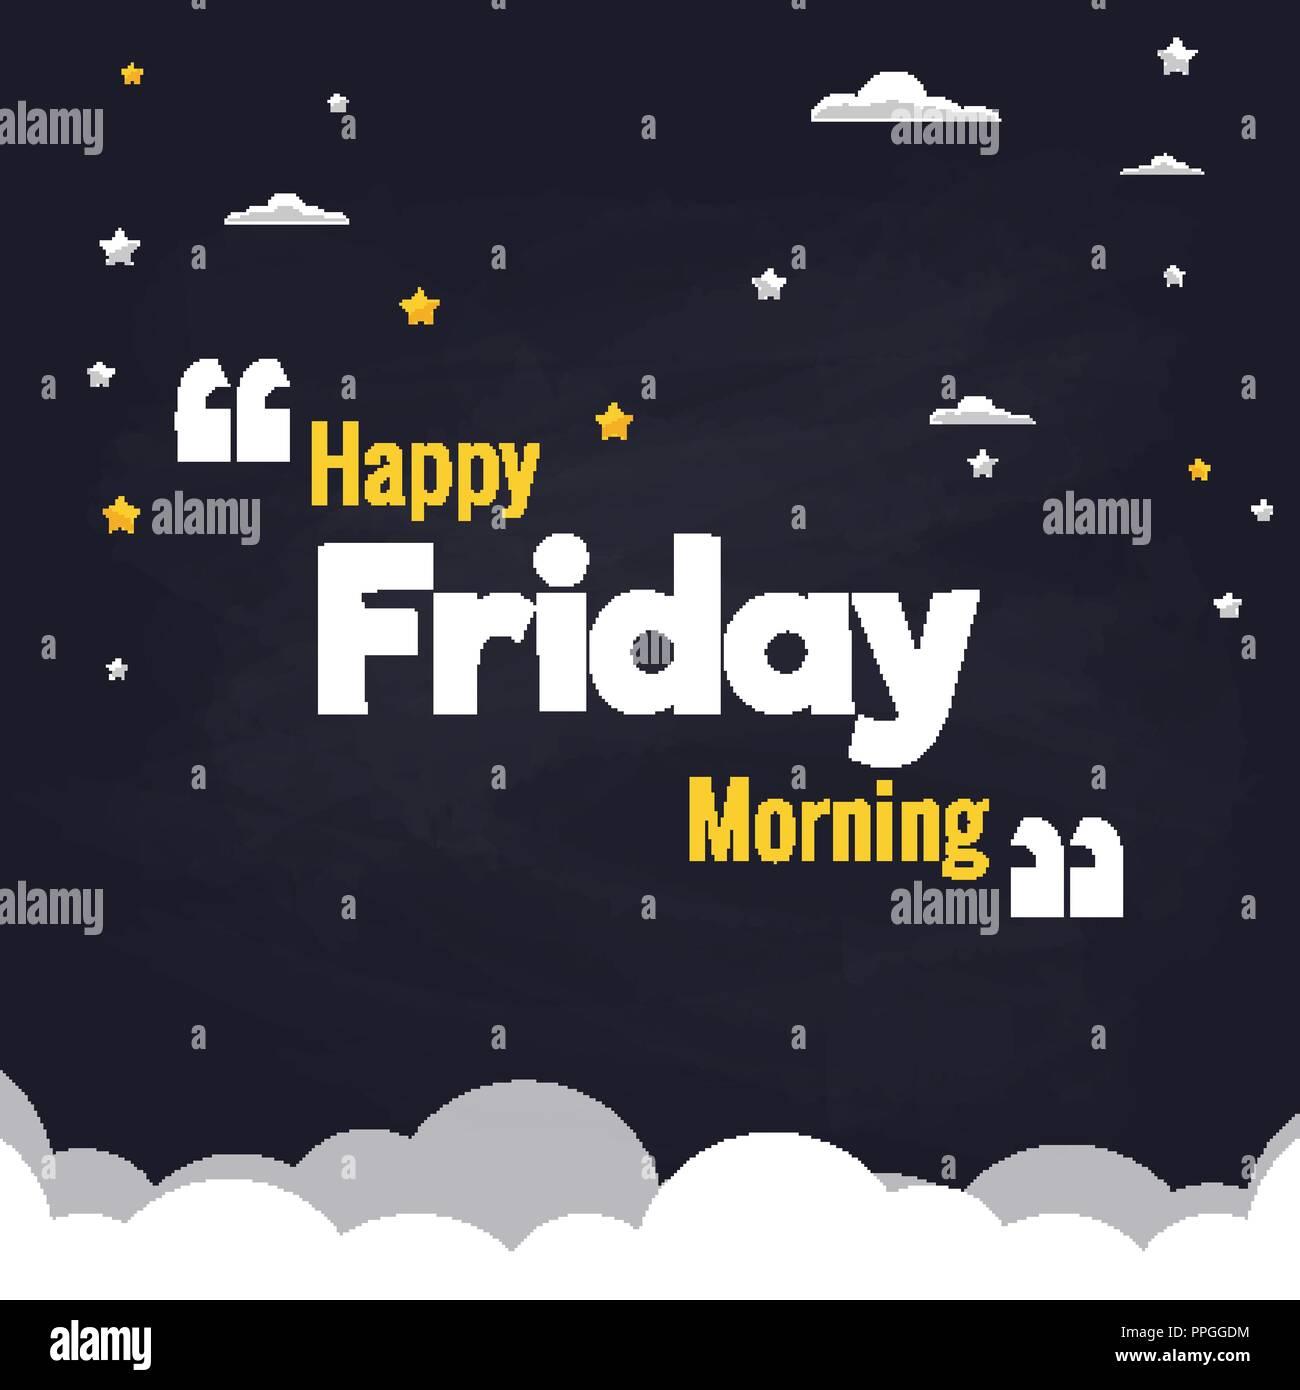 happy friday morning flat illustration background vector design